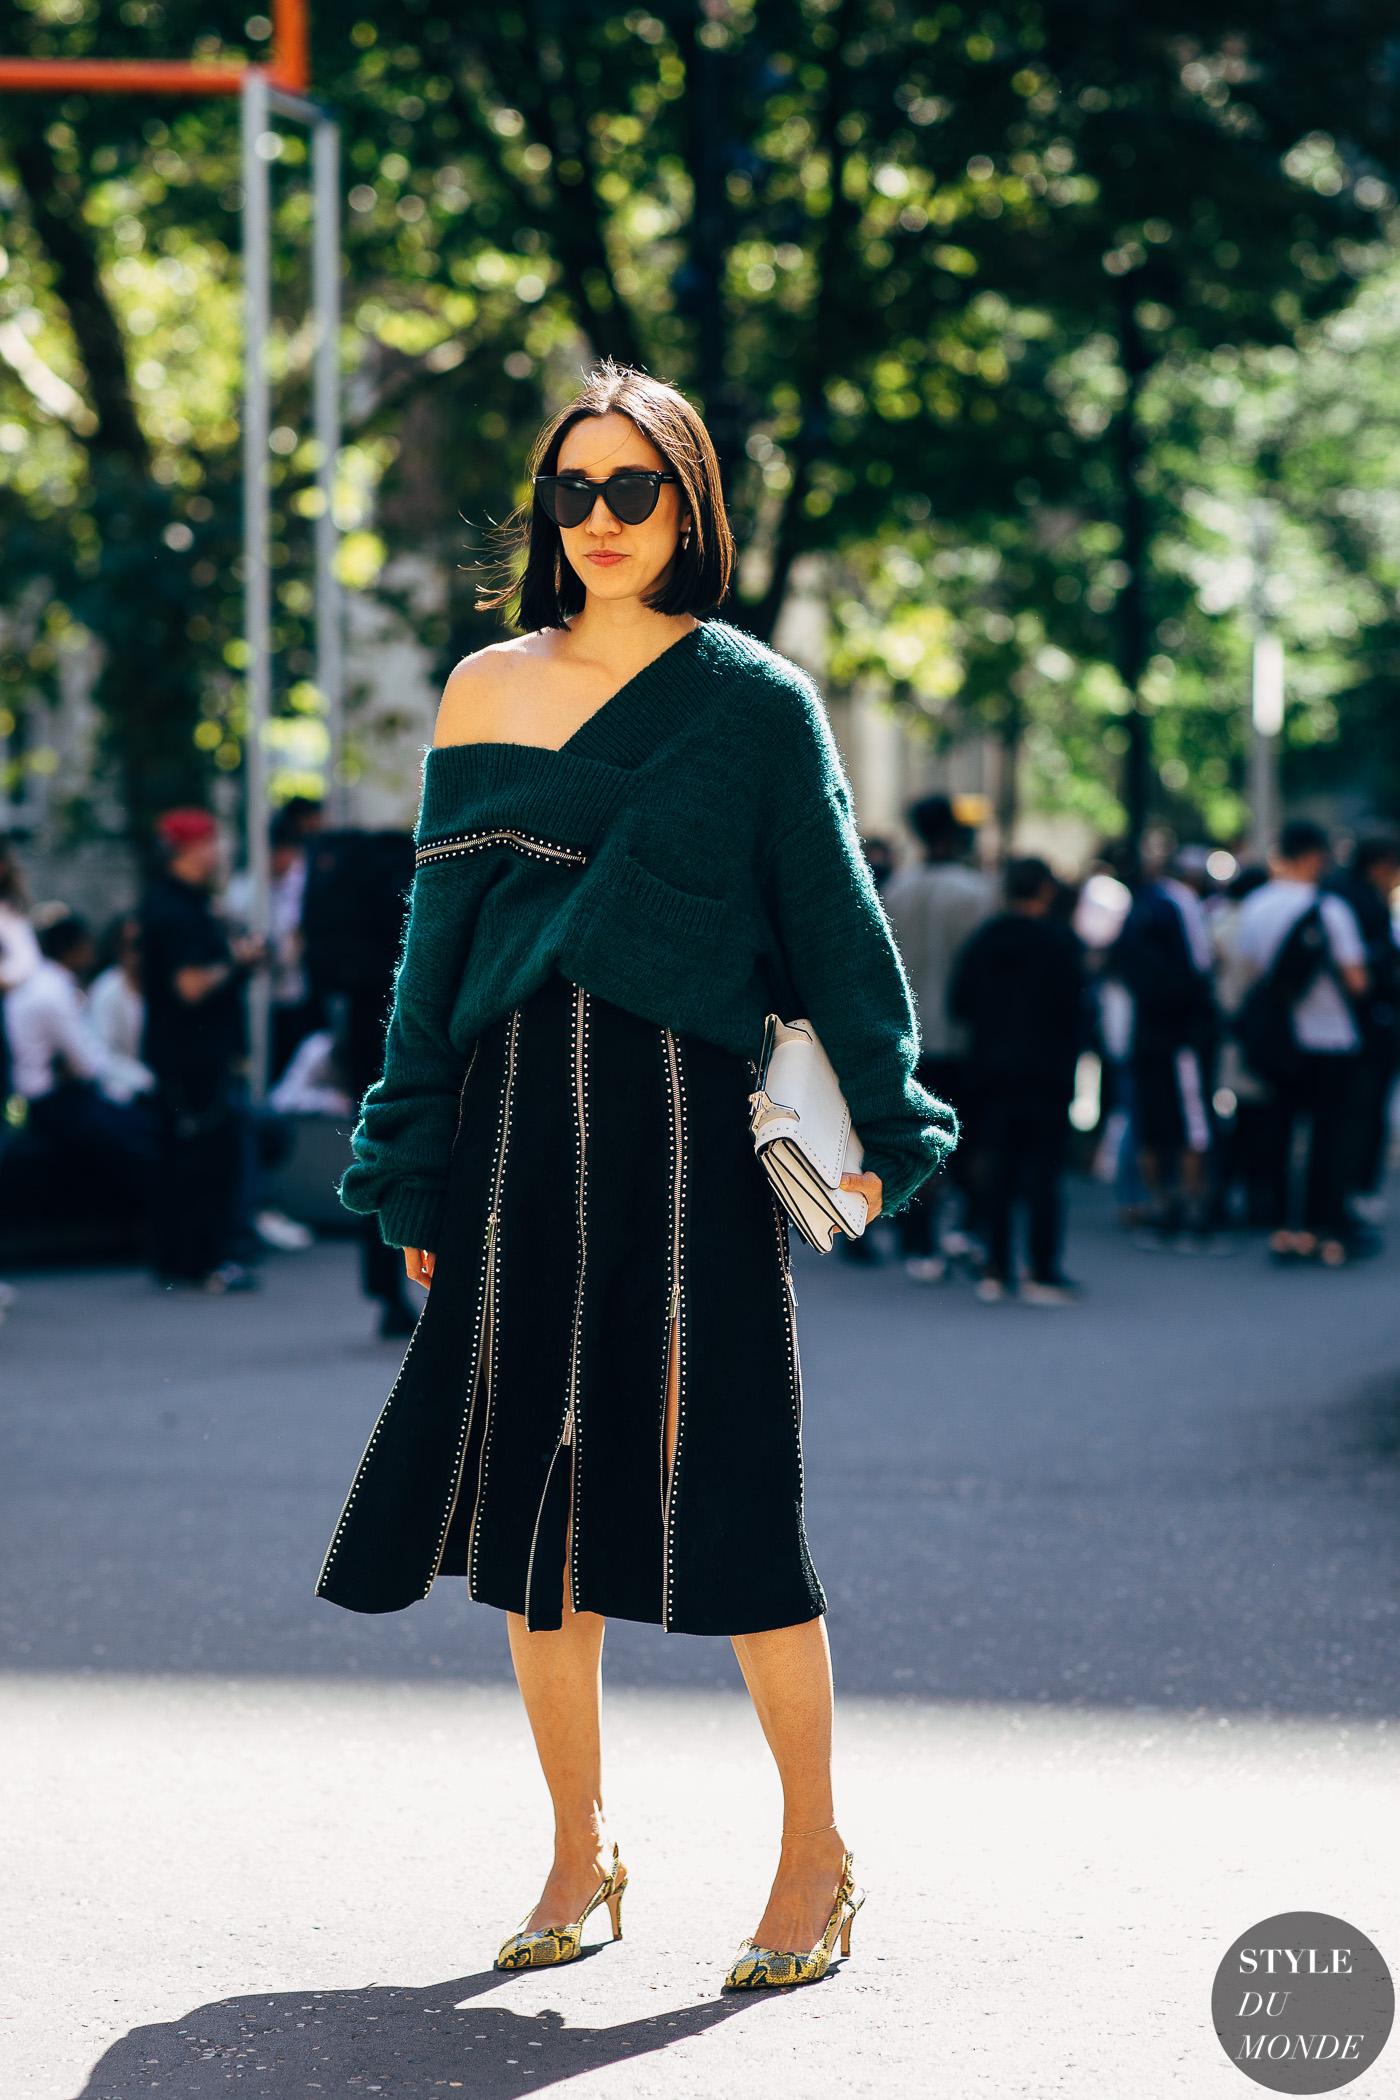 Eva-Chen-by-STYLEDUMONDE-Street-Style-Fashion-Photography20180917_48A0542.jpg